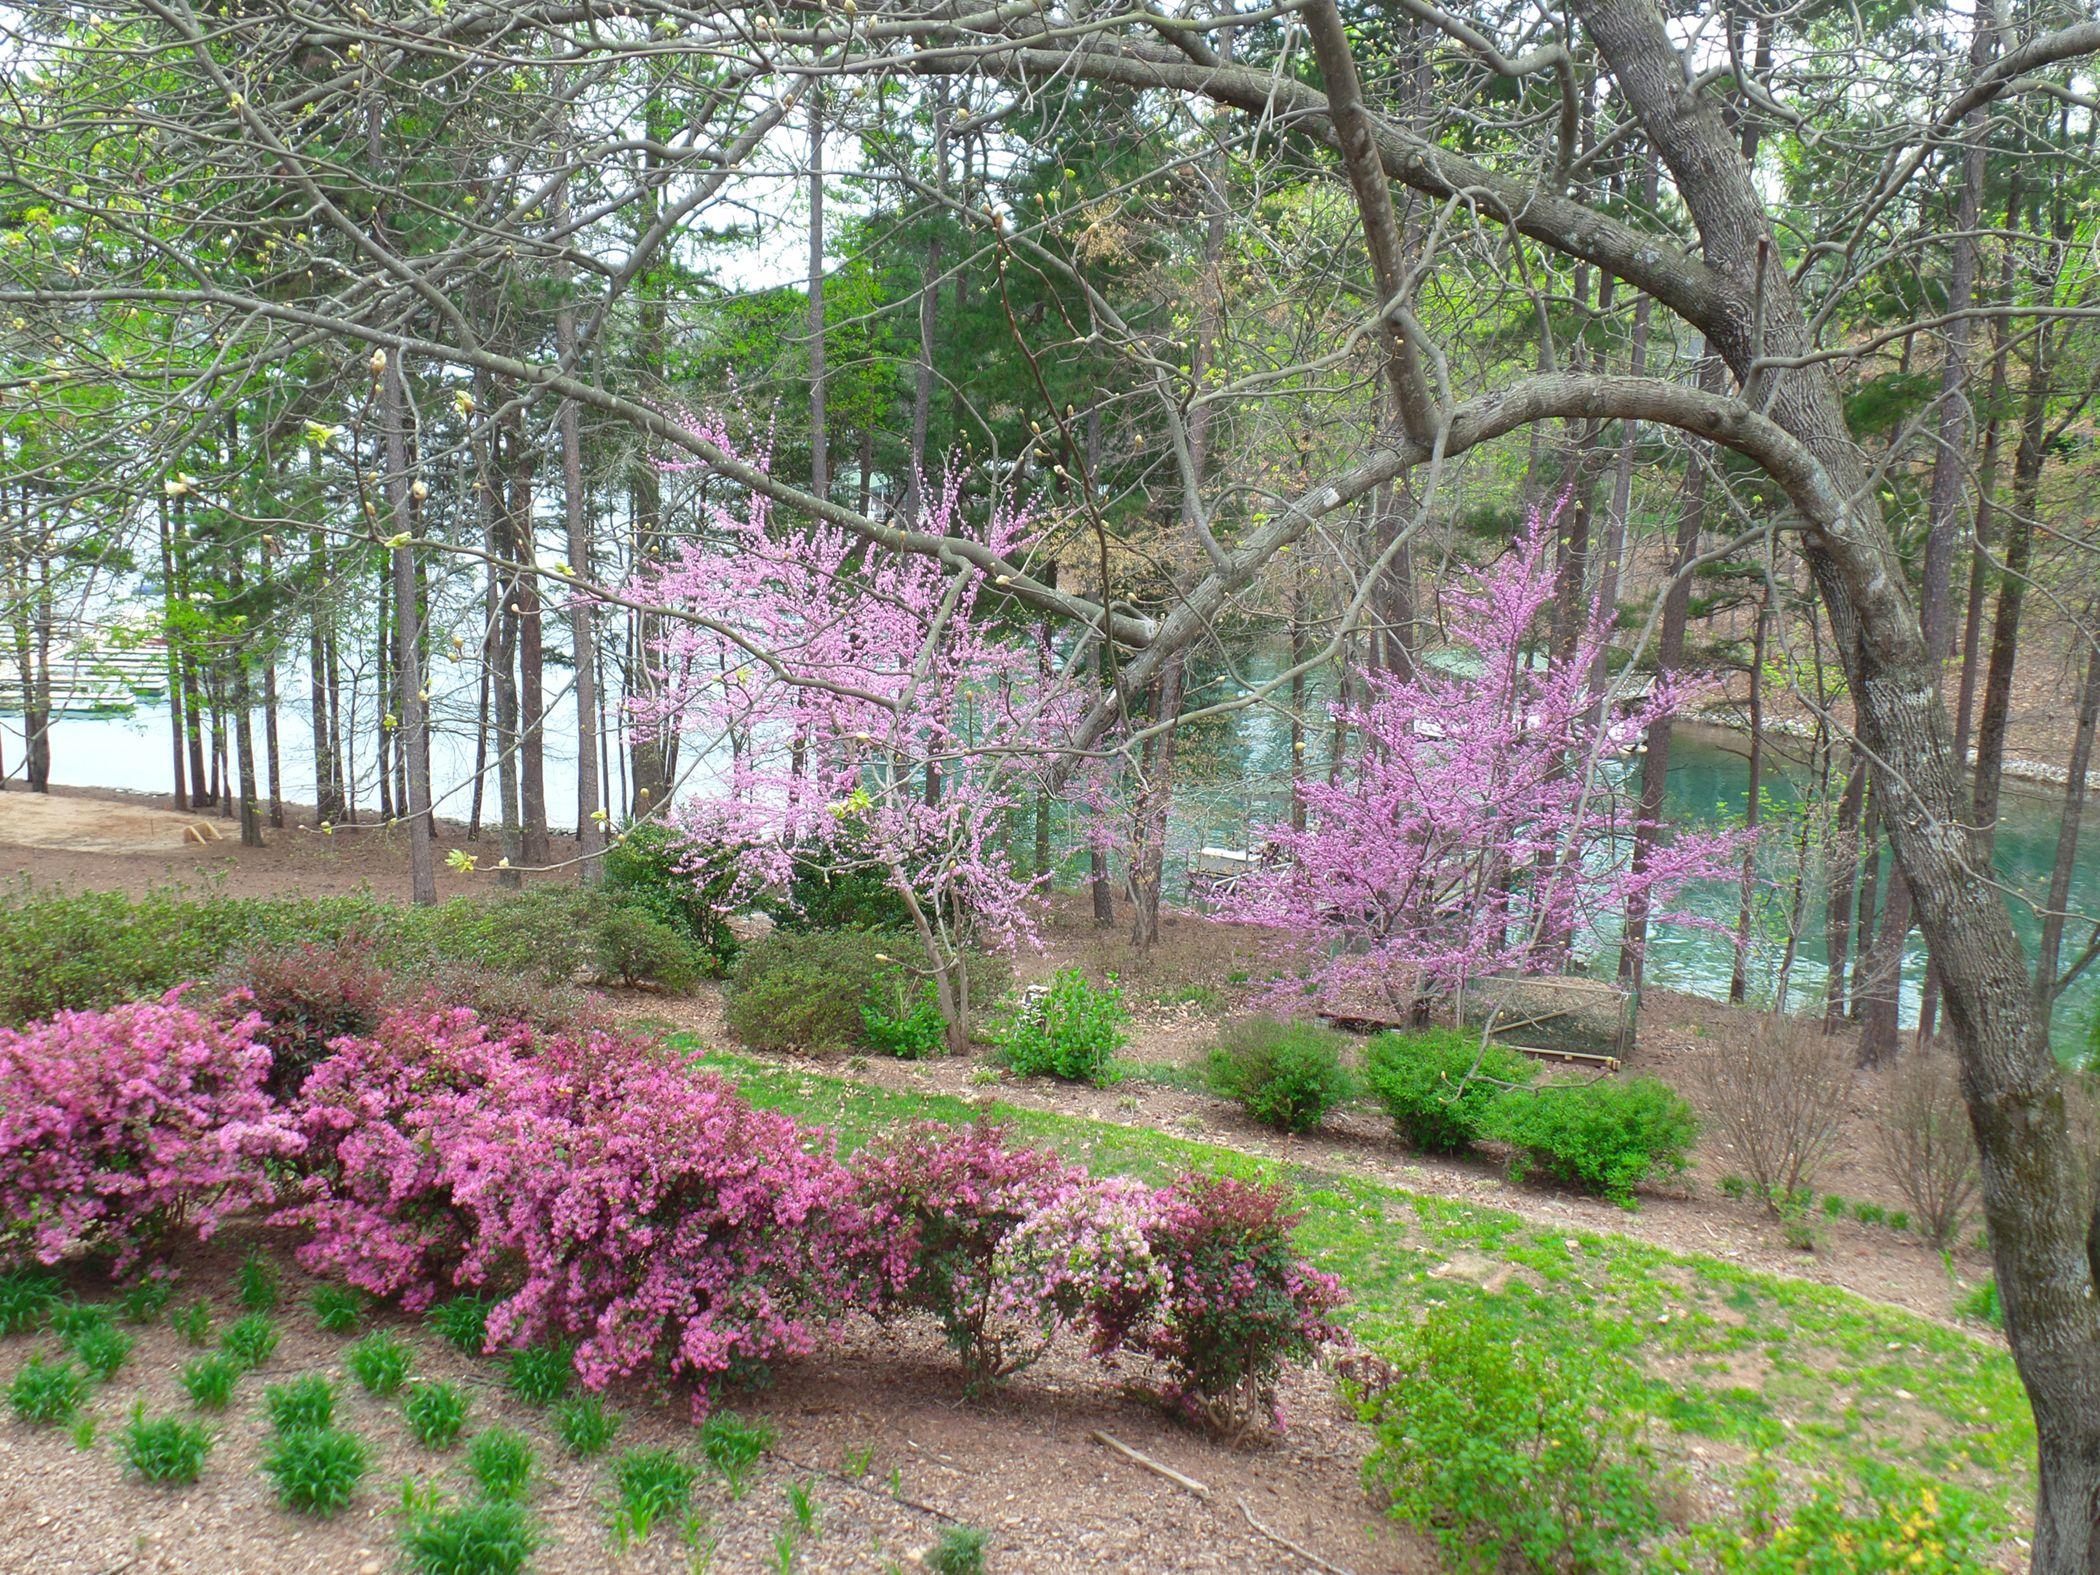 Redbud Trees And Loropetalum Bloom Early In South Carolina My